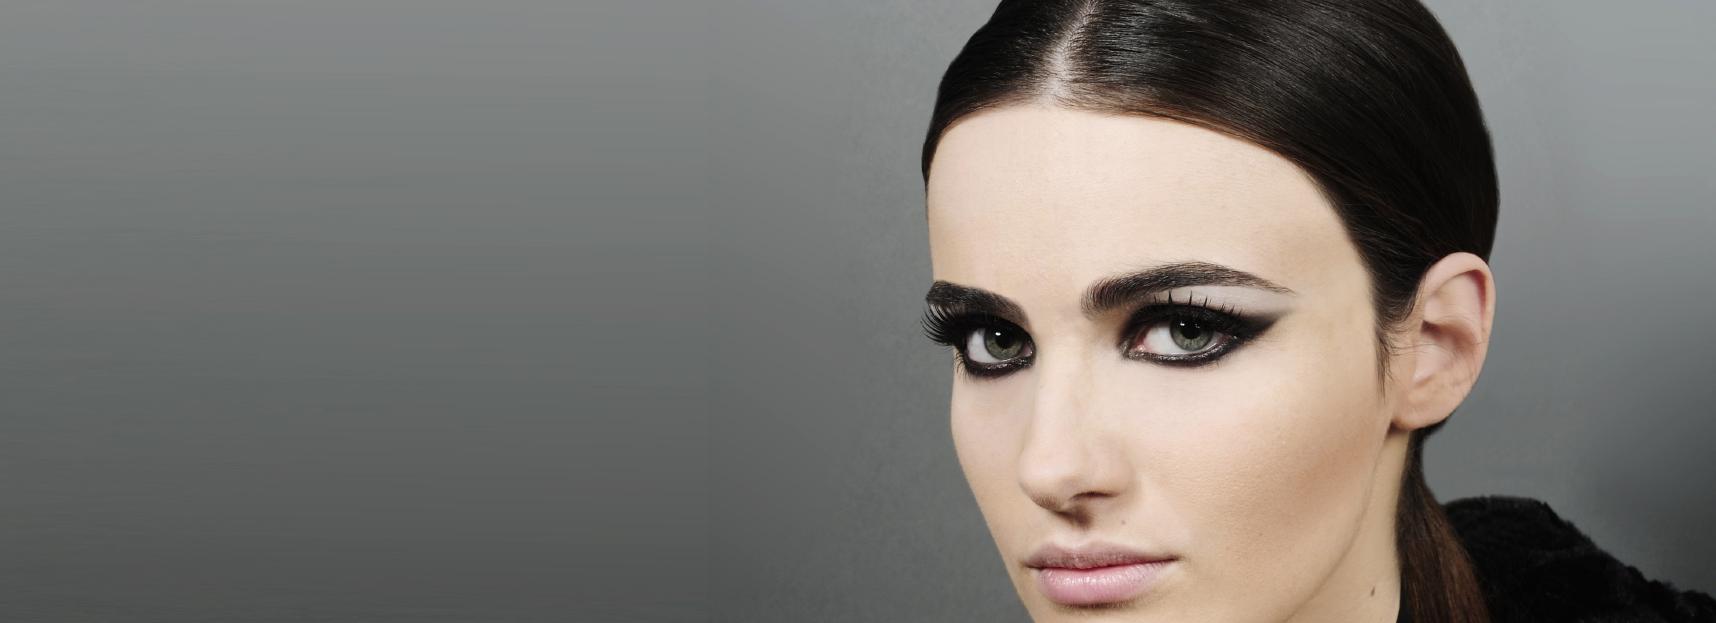 Maquillage à but commercial